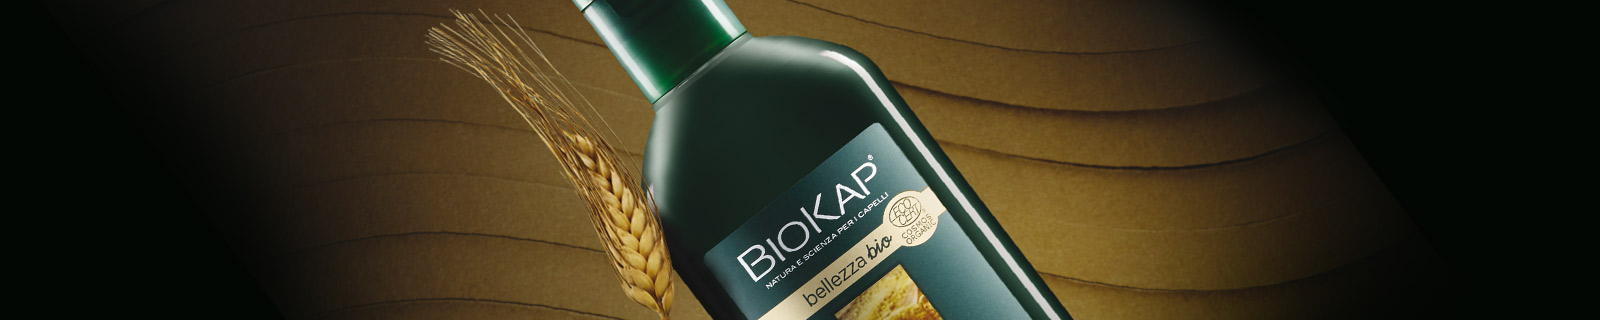 biokap-nutricolor